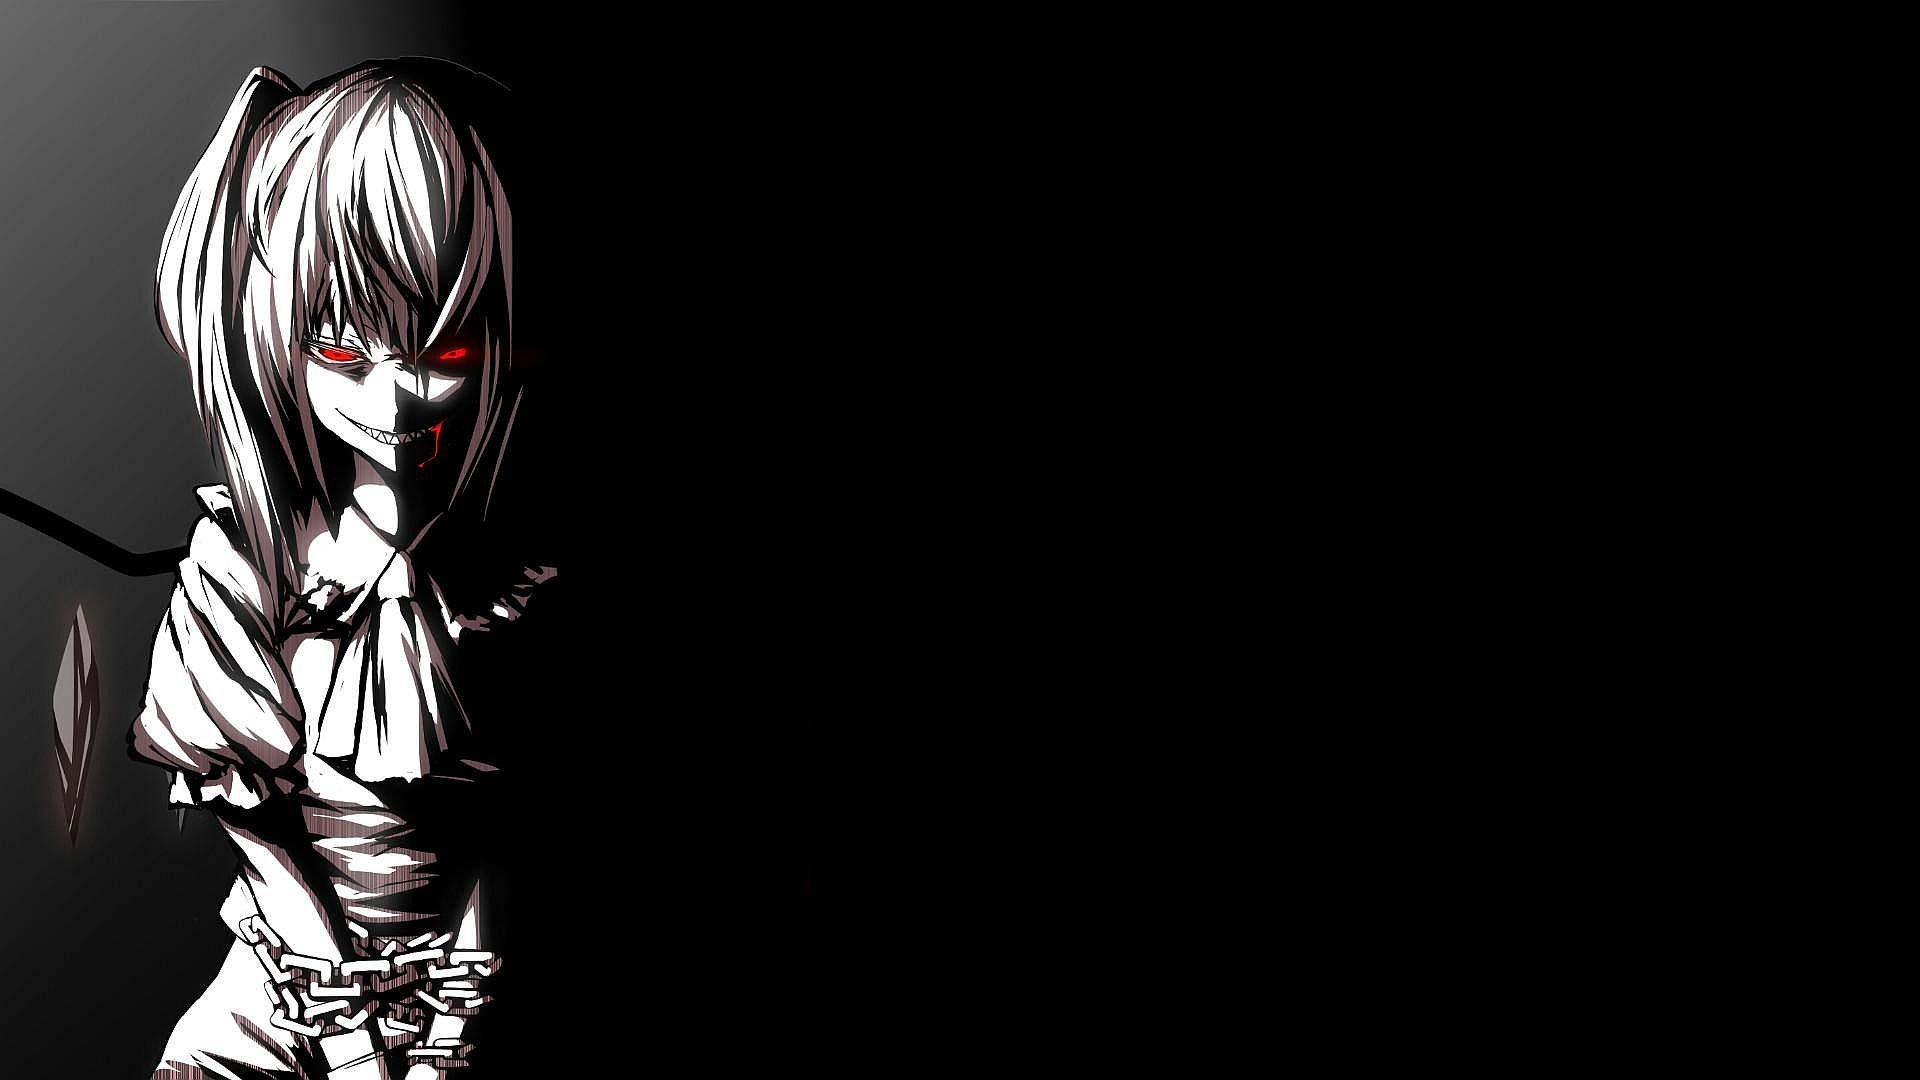 Dark Anime Girl Wallpaper 9691 Hd Wallpapers in Anime   Imagescicom 1920x1080